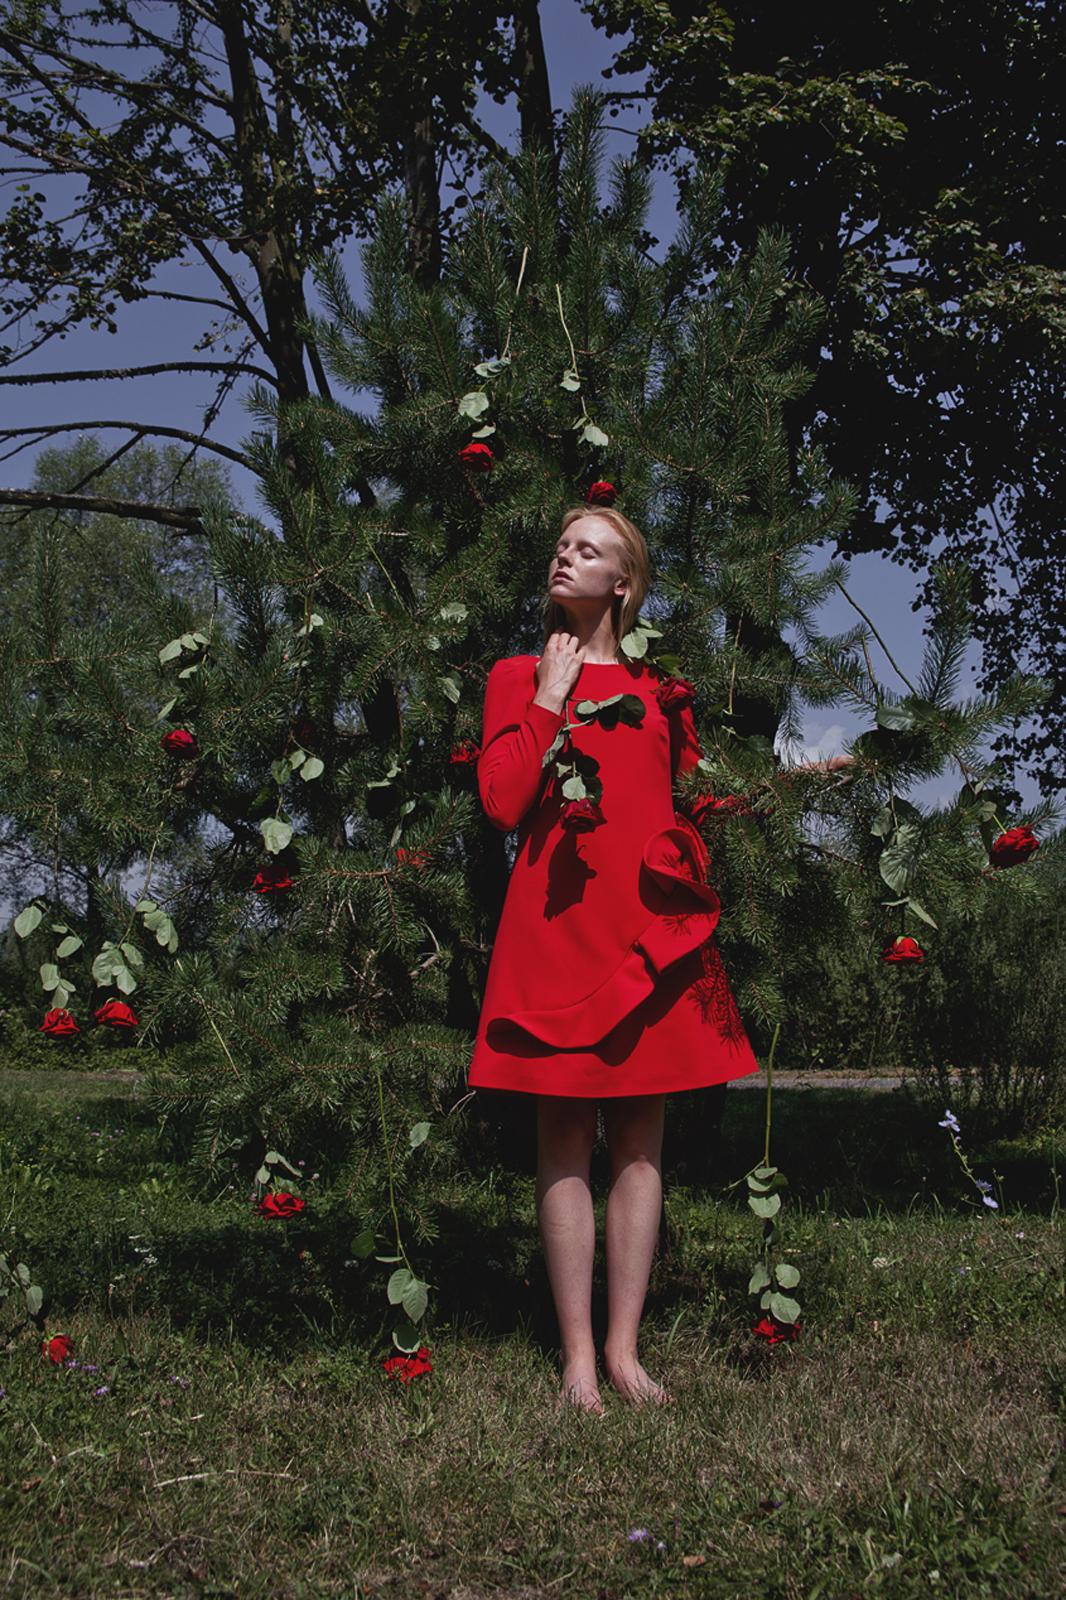 porta nova flower chef art photography